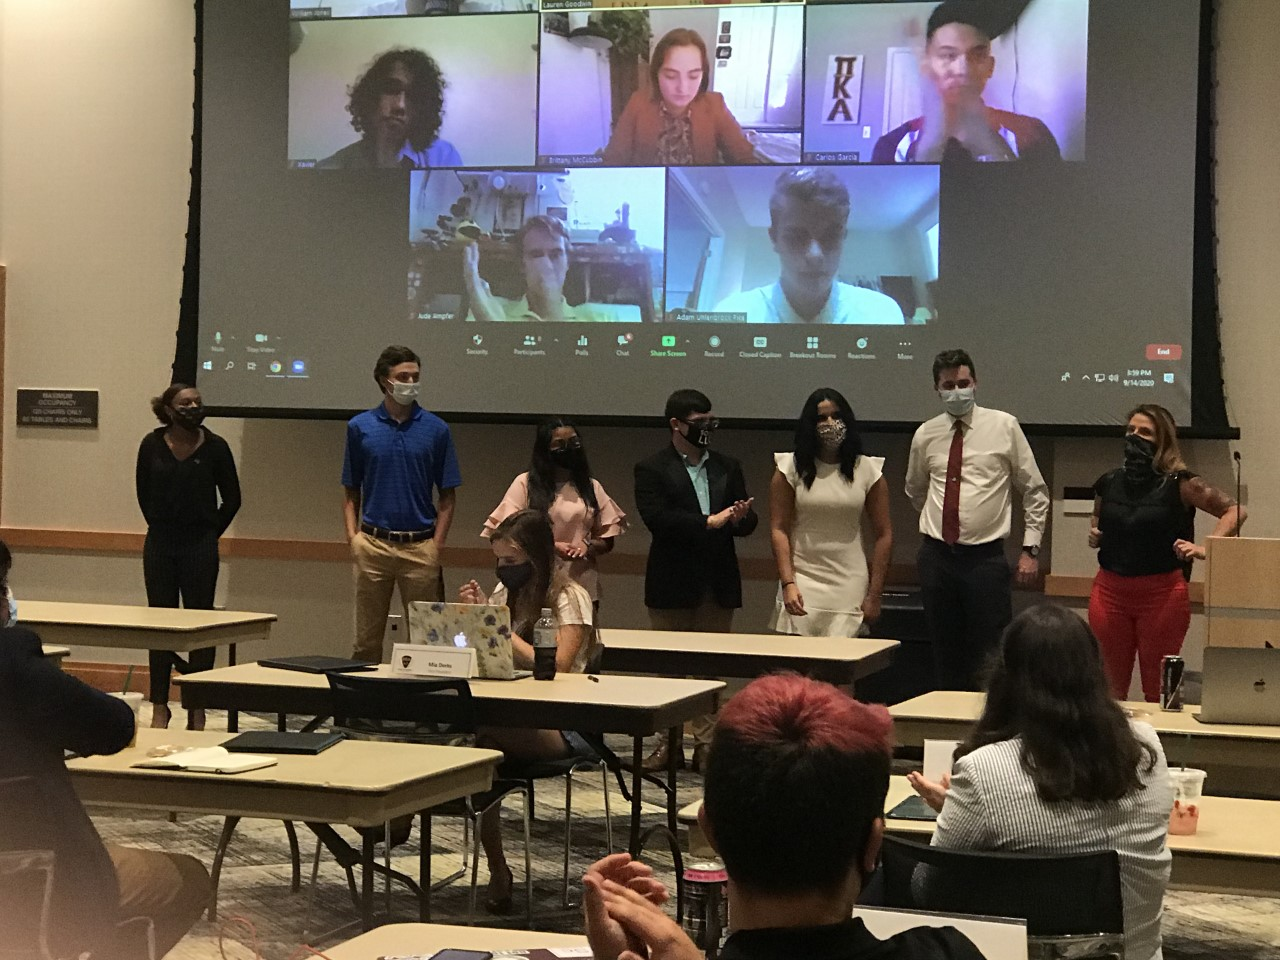 "Seven NKU students were sworn in as new SGA senators. From right to left: Mia Potter, Landon Meador, Karla Arango, James ""Jimmy"" Renton, Wendi Cantero, Tanner Stevenson and Kaitlin Minniefield."